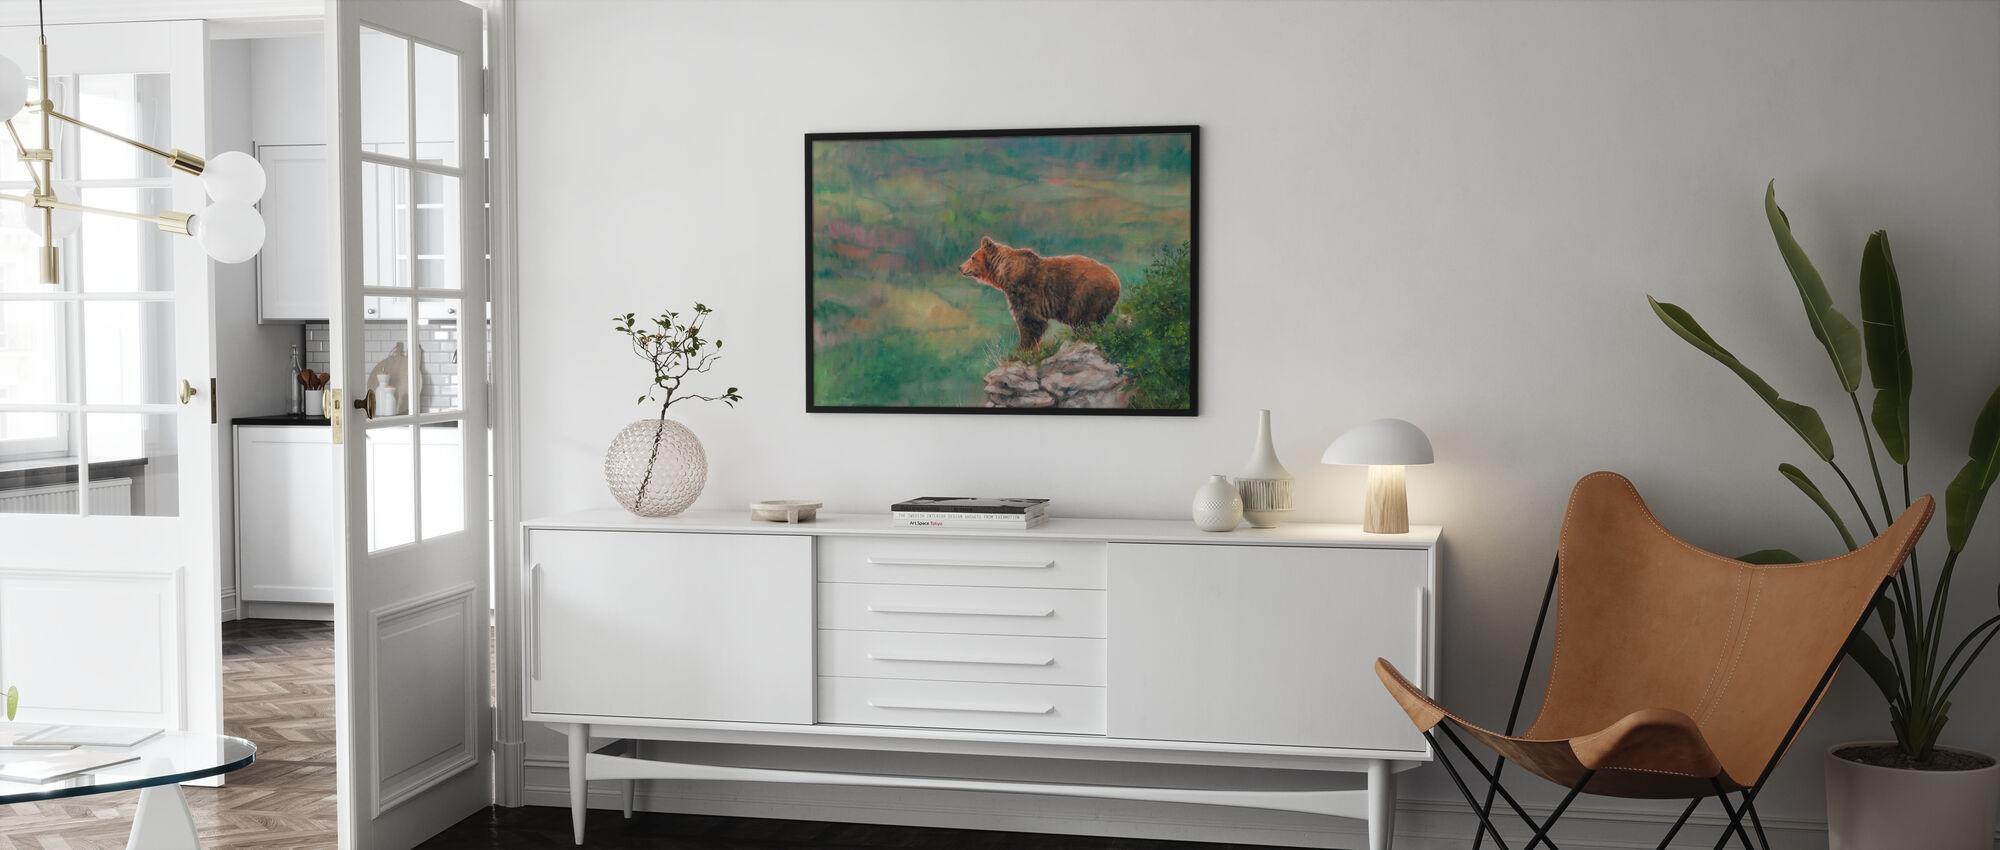 European Brown Bear - Poster - Living Room